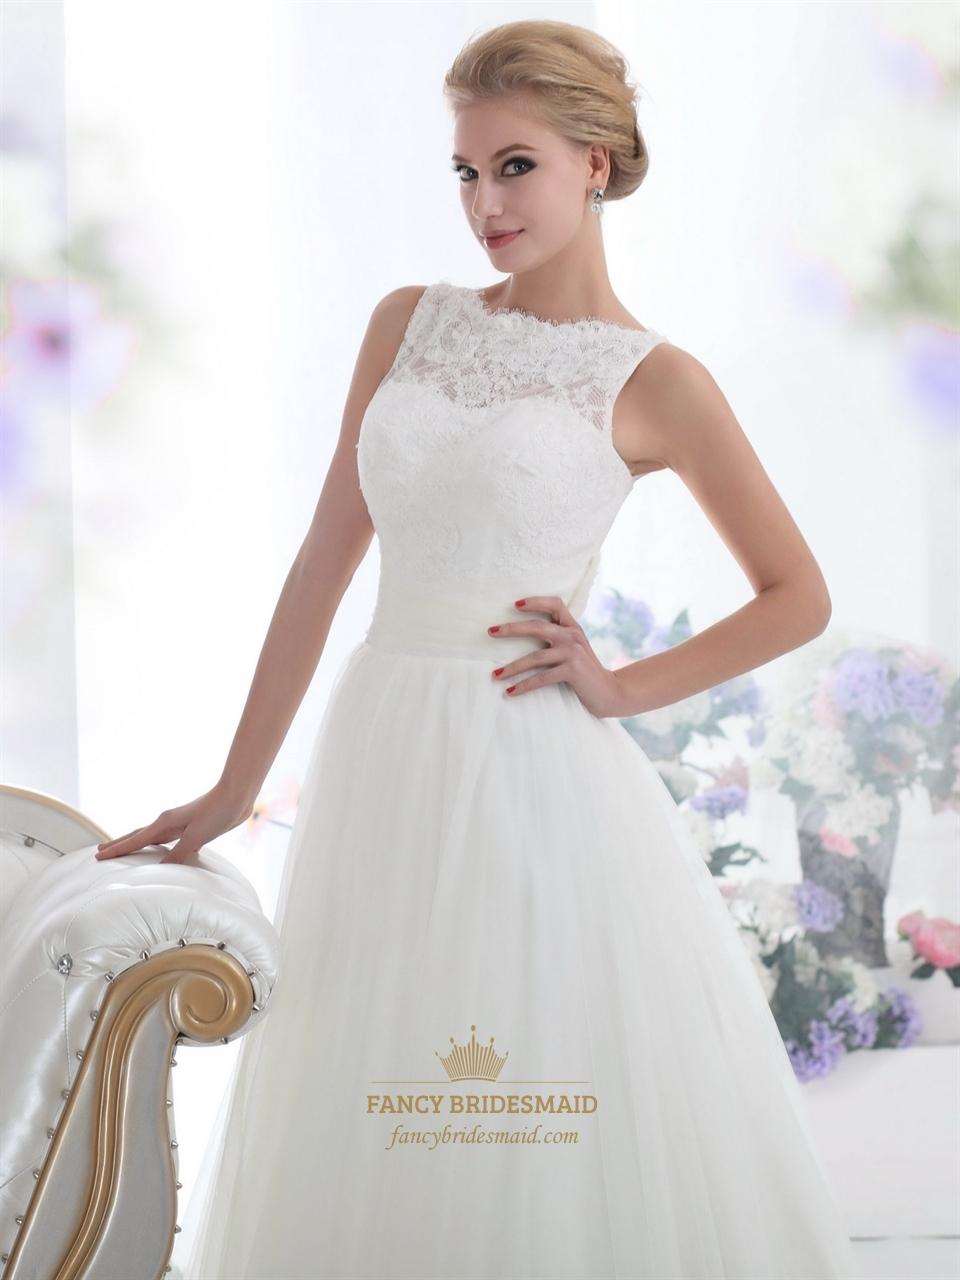 Elegant Ivory Lace Bodice Tulle Skirt Wedding Dress For